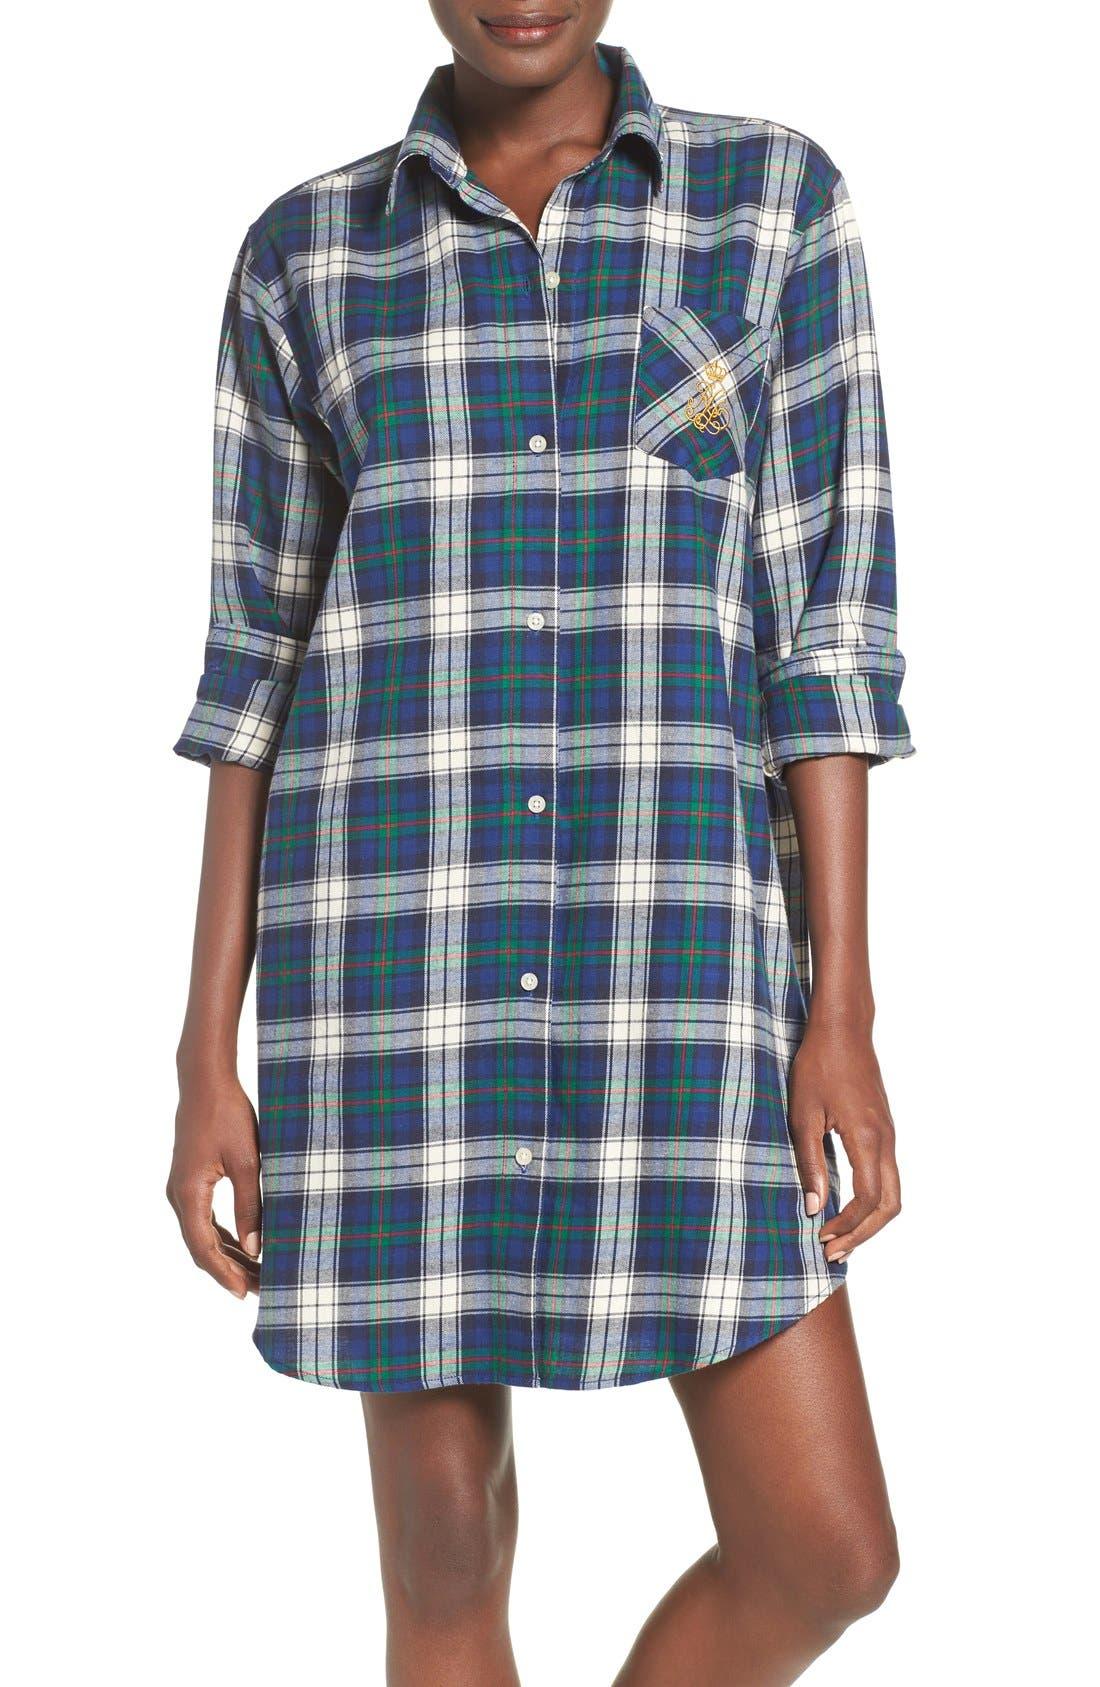 Alternate Image 1 Selected - Lauren Ralph Lauren Plaid Woven Sleep Shirt